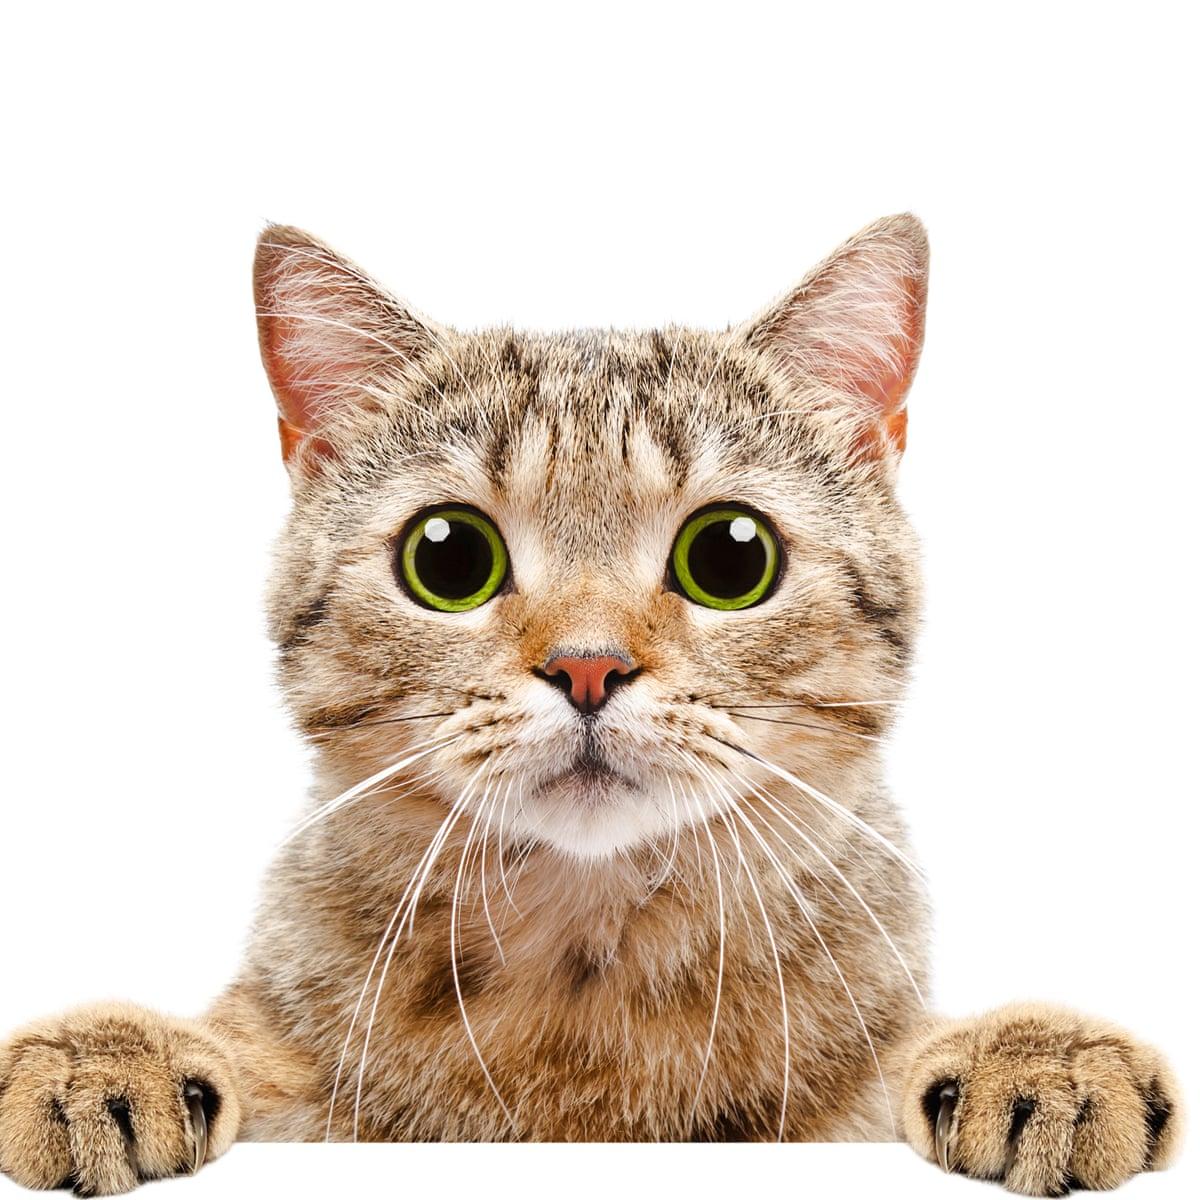 Download Adorable Cat Pictures Photos Images 2VAbog6uM